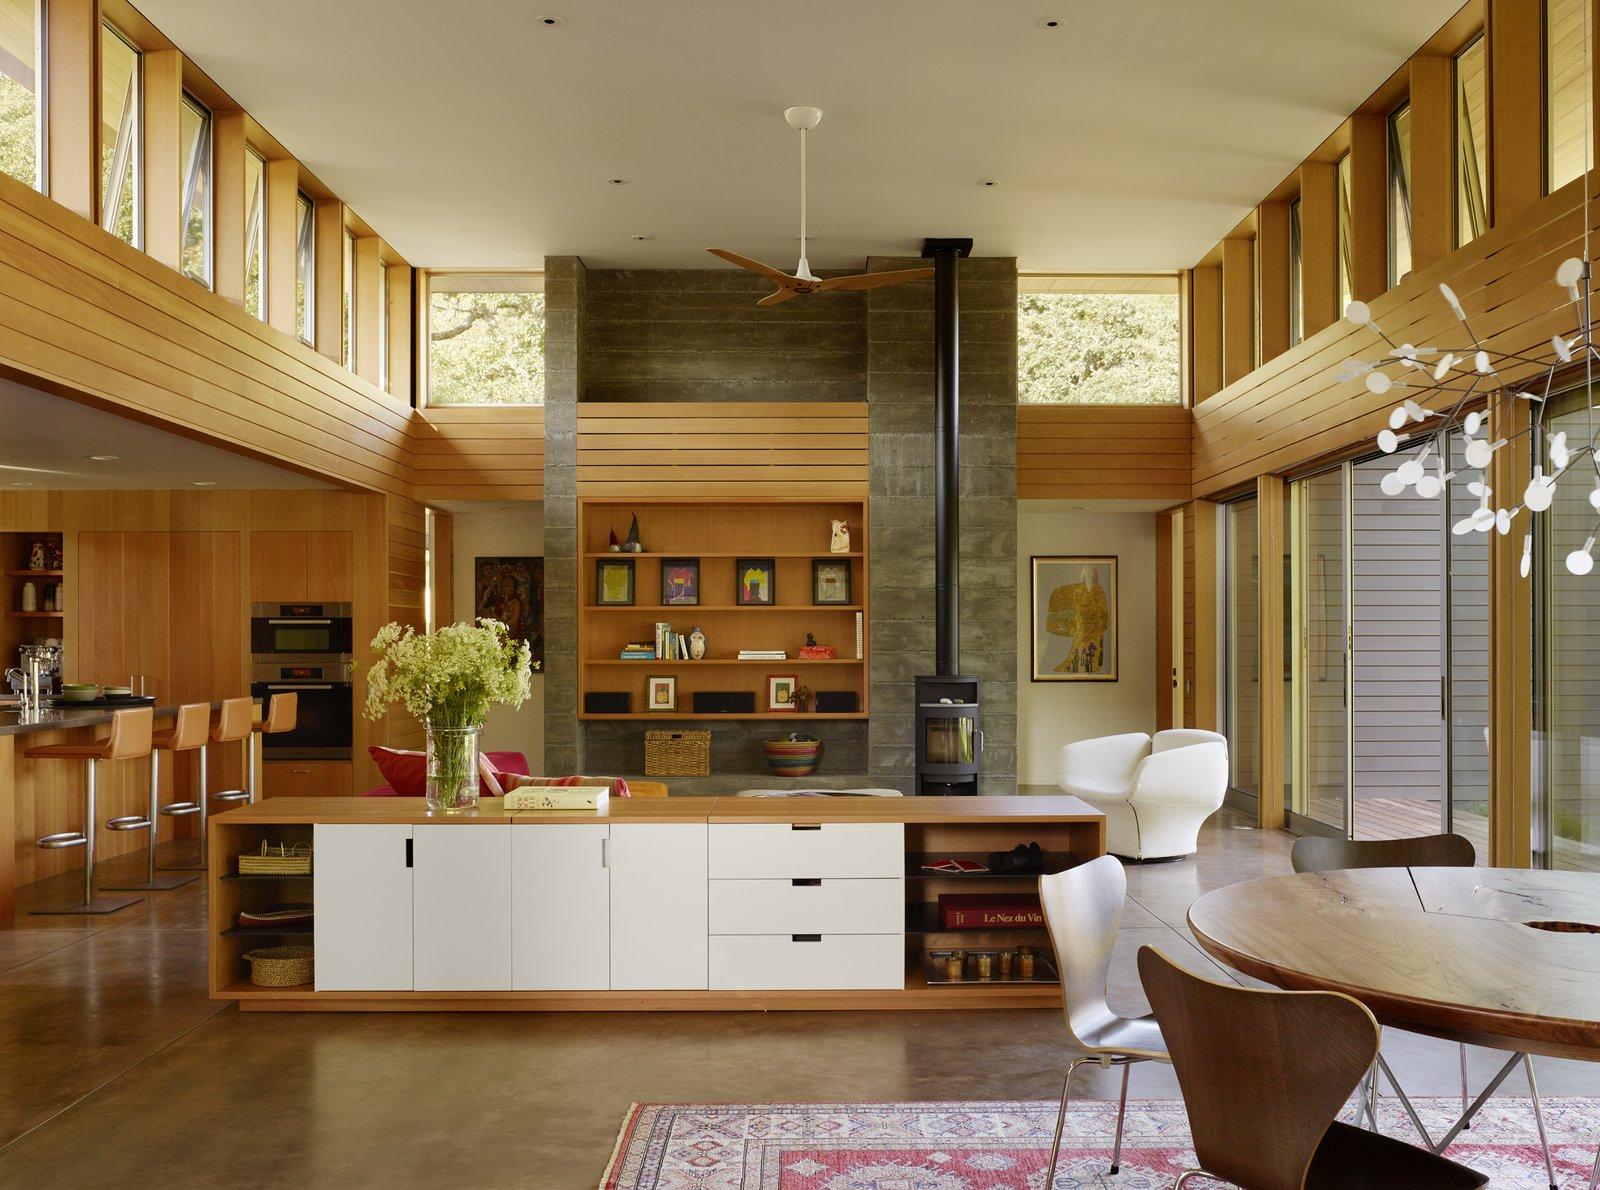 Kitchen and Concrete Floor #TurnbullGriffinHaesloop #interior #livingroom  #window  Sonoma Residence by Turnbull Griffin Haesloop Architects